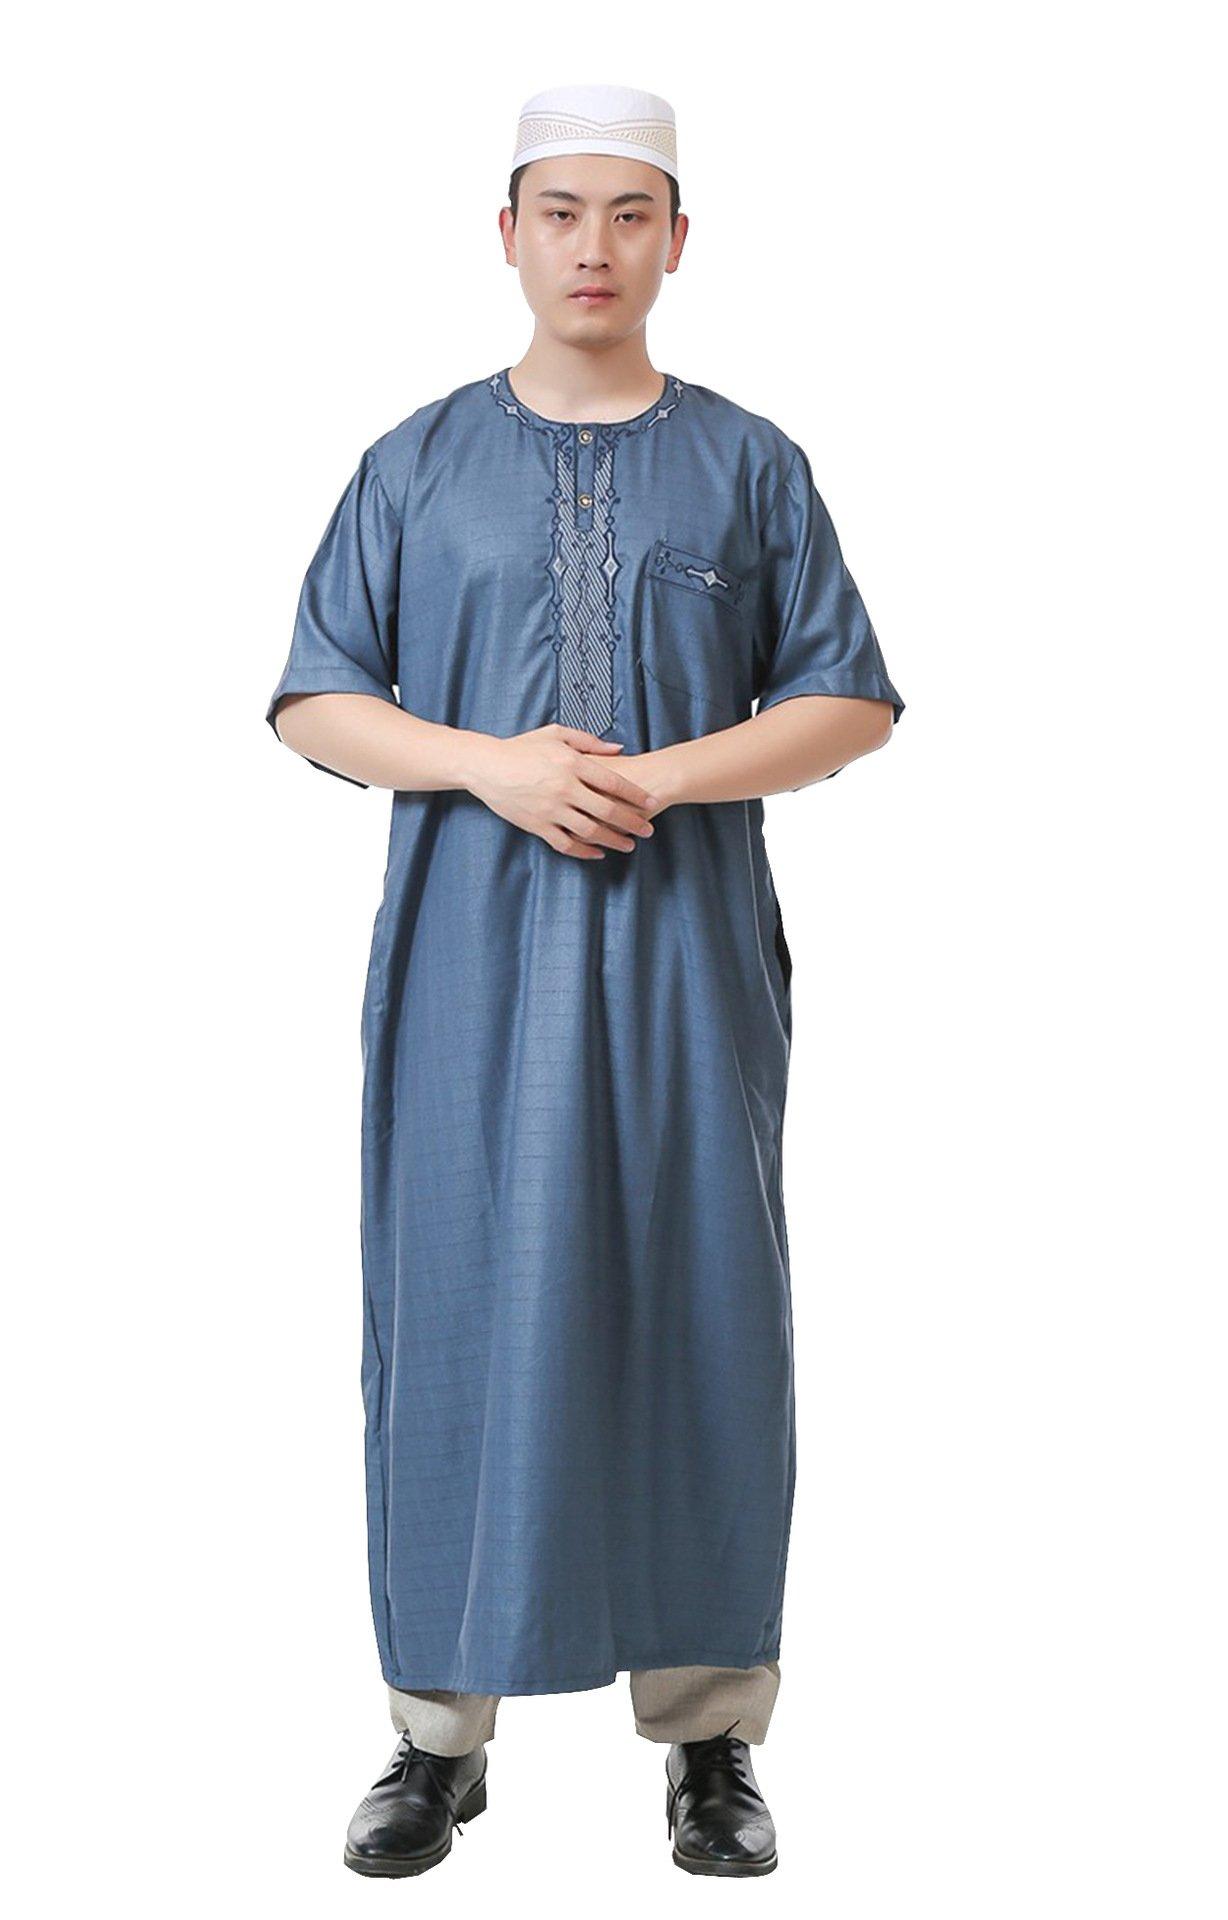 GladThink Men's Arab Muslim Islamic Church Worship Long Thobe with Short Sleeves Lakeblue 56